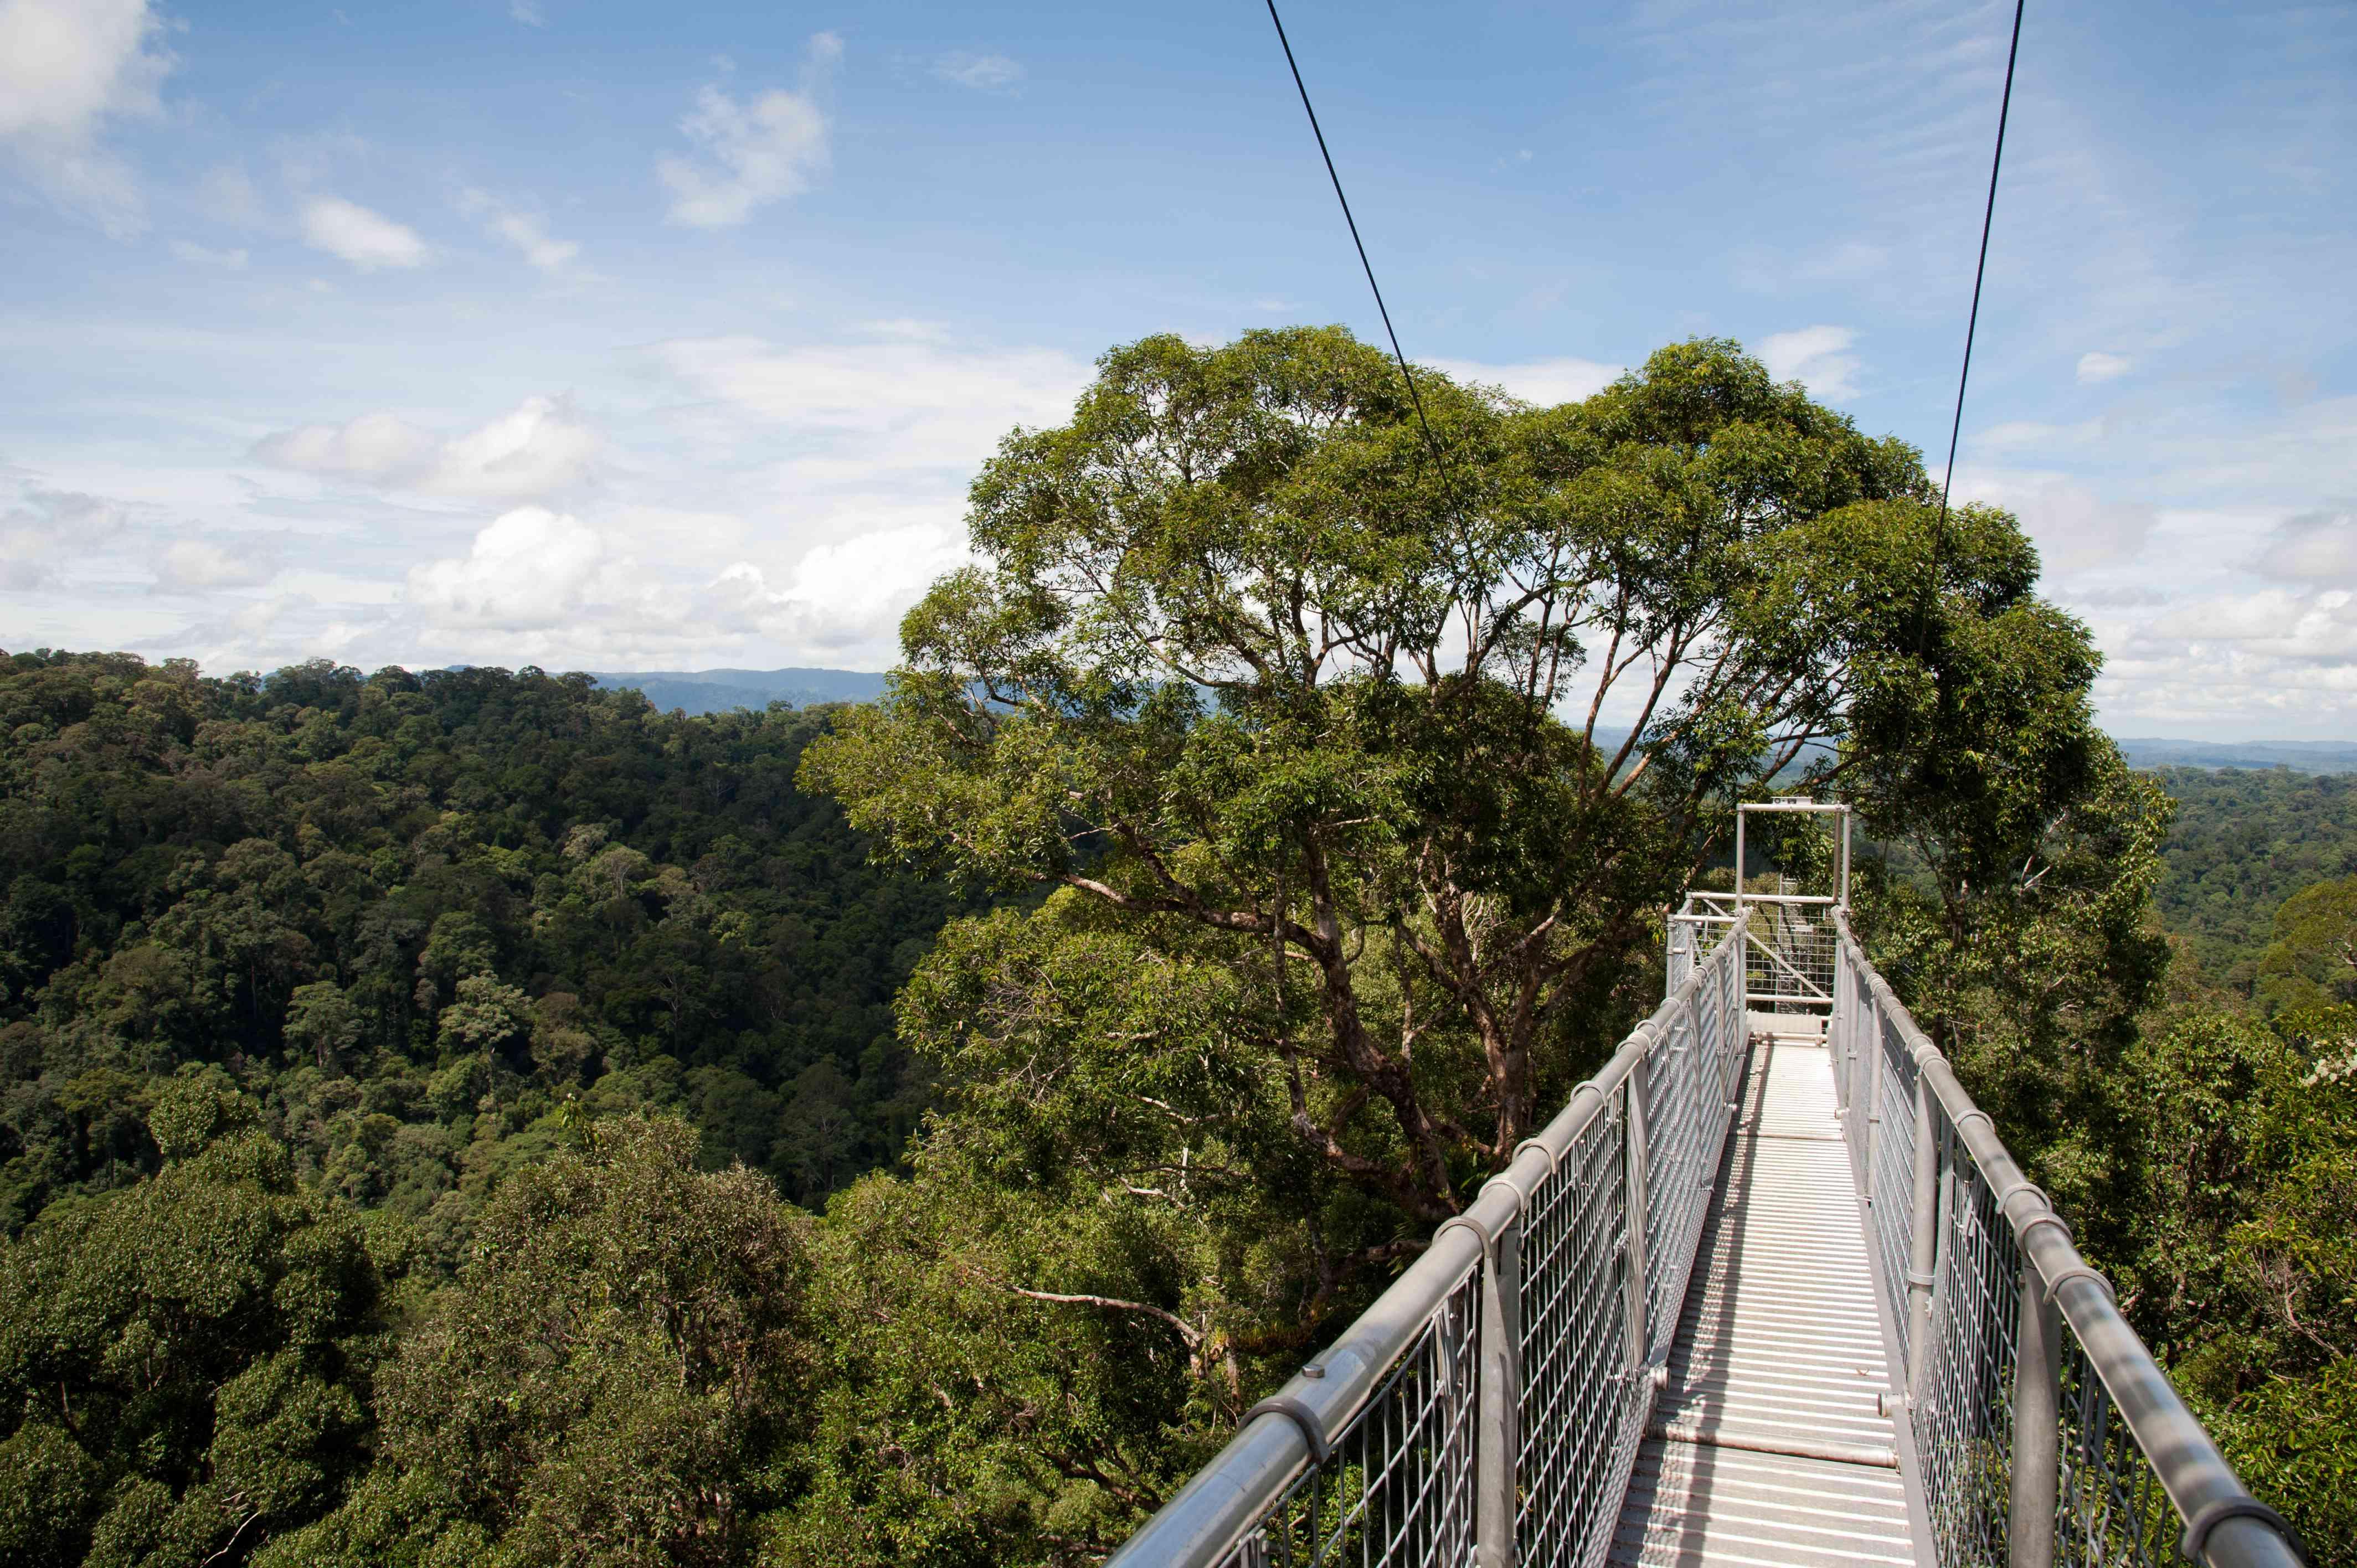 Canopy walk at Ulu Temburong National Park, Borneo